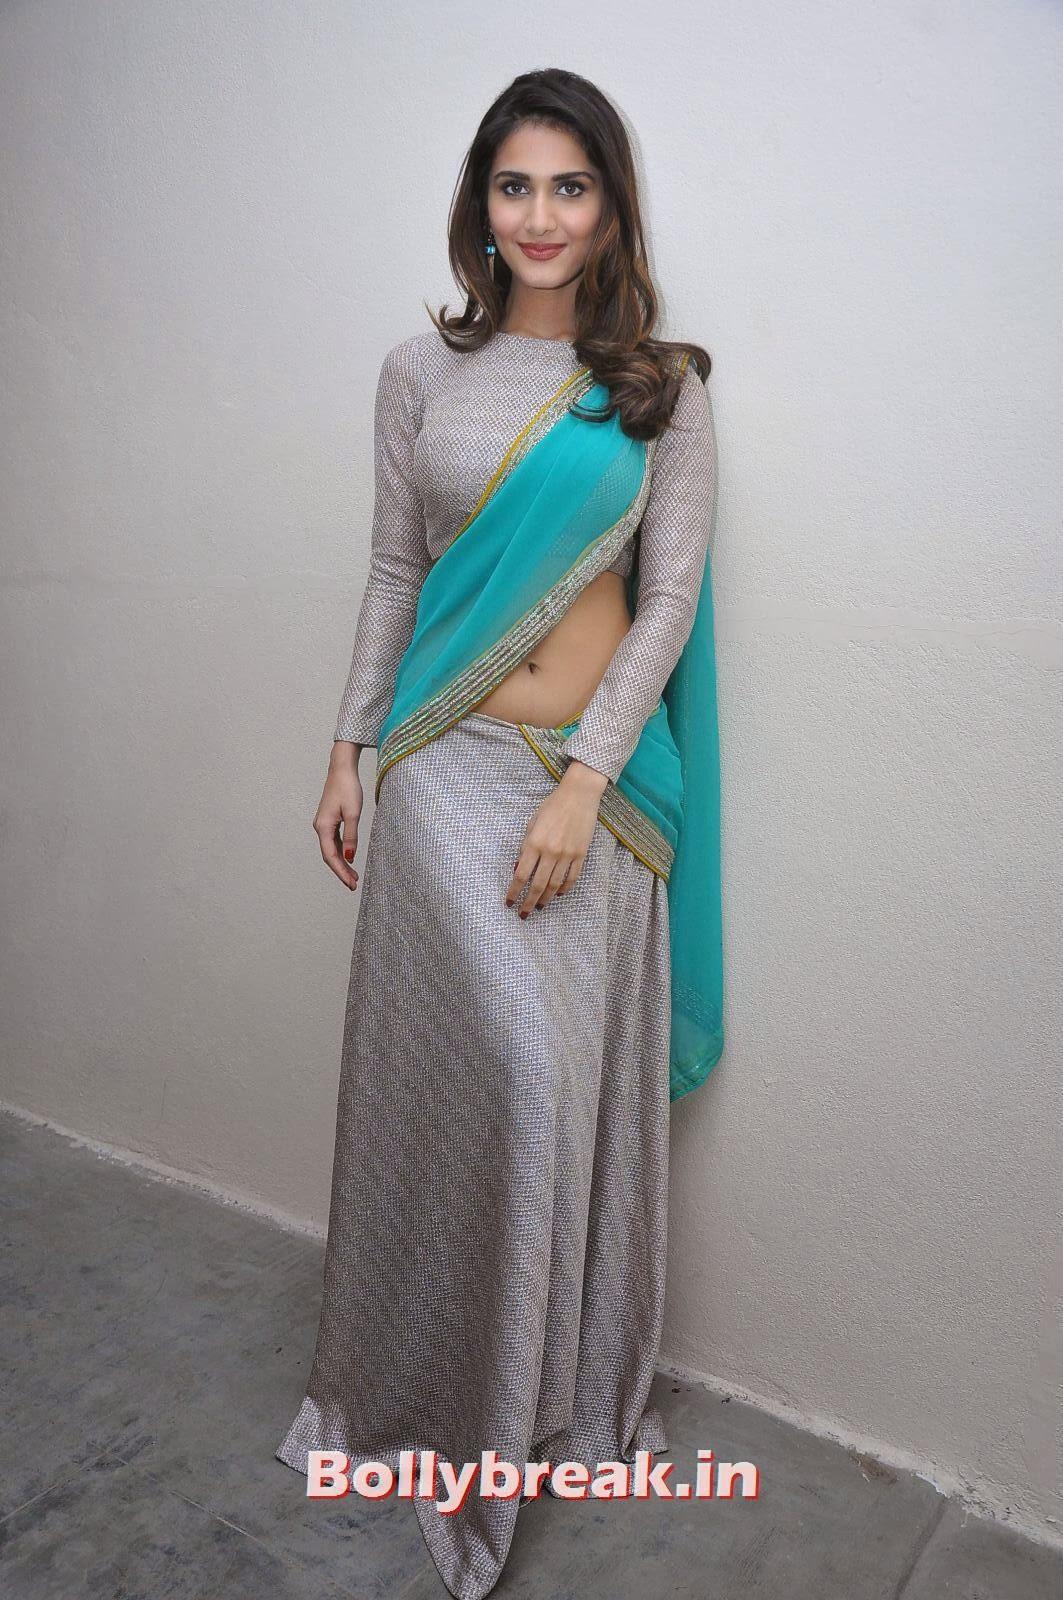 , Vaani Kapoor Images in Saree - Navel Photo Gallery